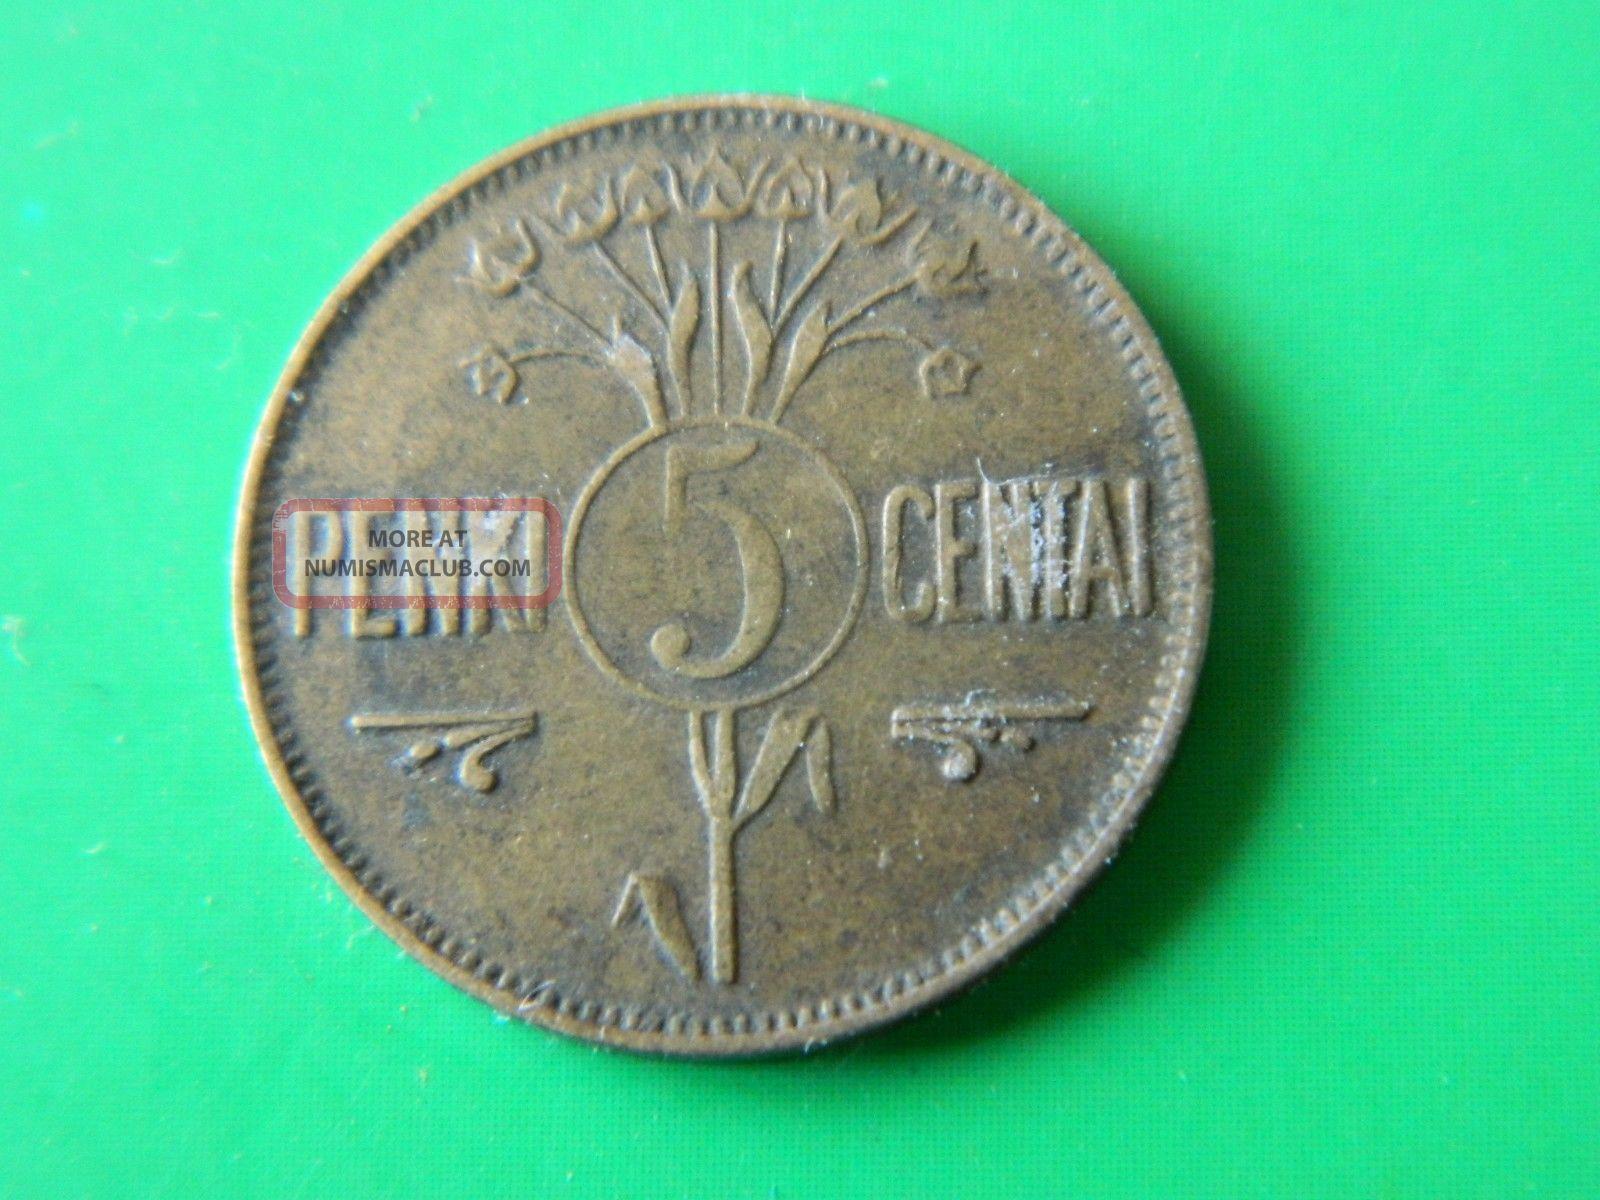 Lithuania 5 Centai 1925 (1765) Europe photo